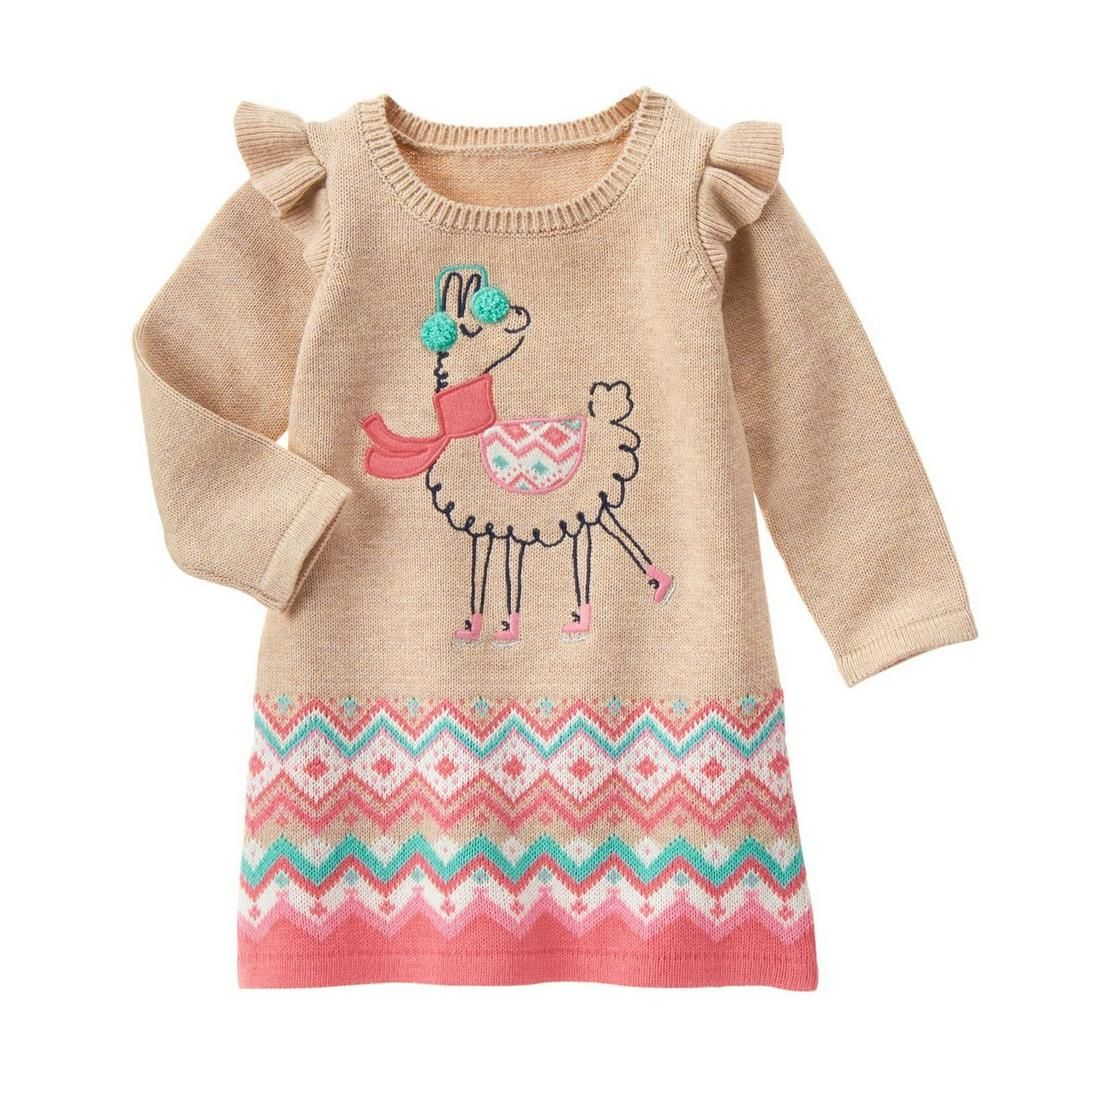 b29a403eceaf Gymboree Popsicle Party 2T Blue Ice Cream Dress Set Pink Cardigan & Socks # Gymboree #Everyday | My eBay Store | Pink cardigan, Dresses, Popsicle party